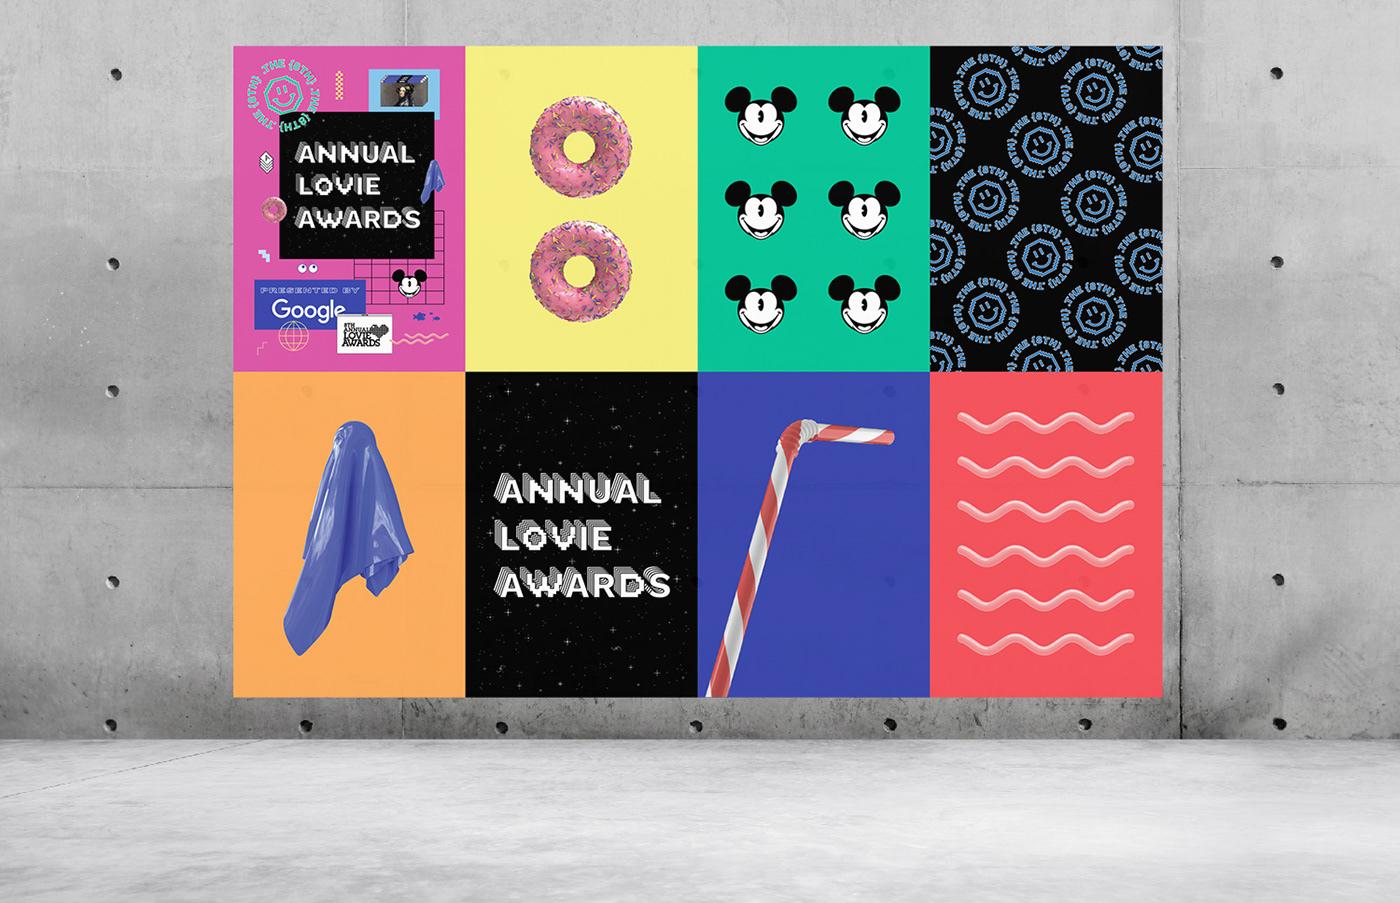 lovie awards  google poster identity graphic design  3d animation motion graphic Internet retro design graphic art